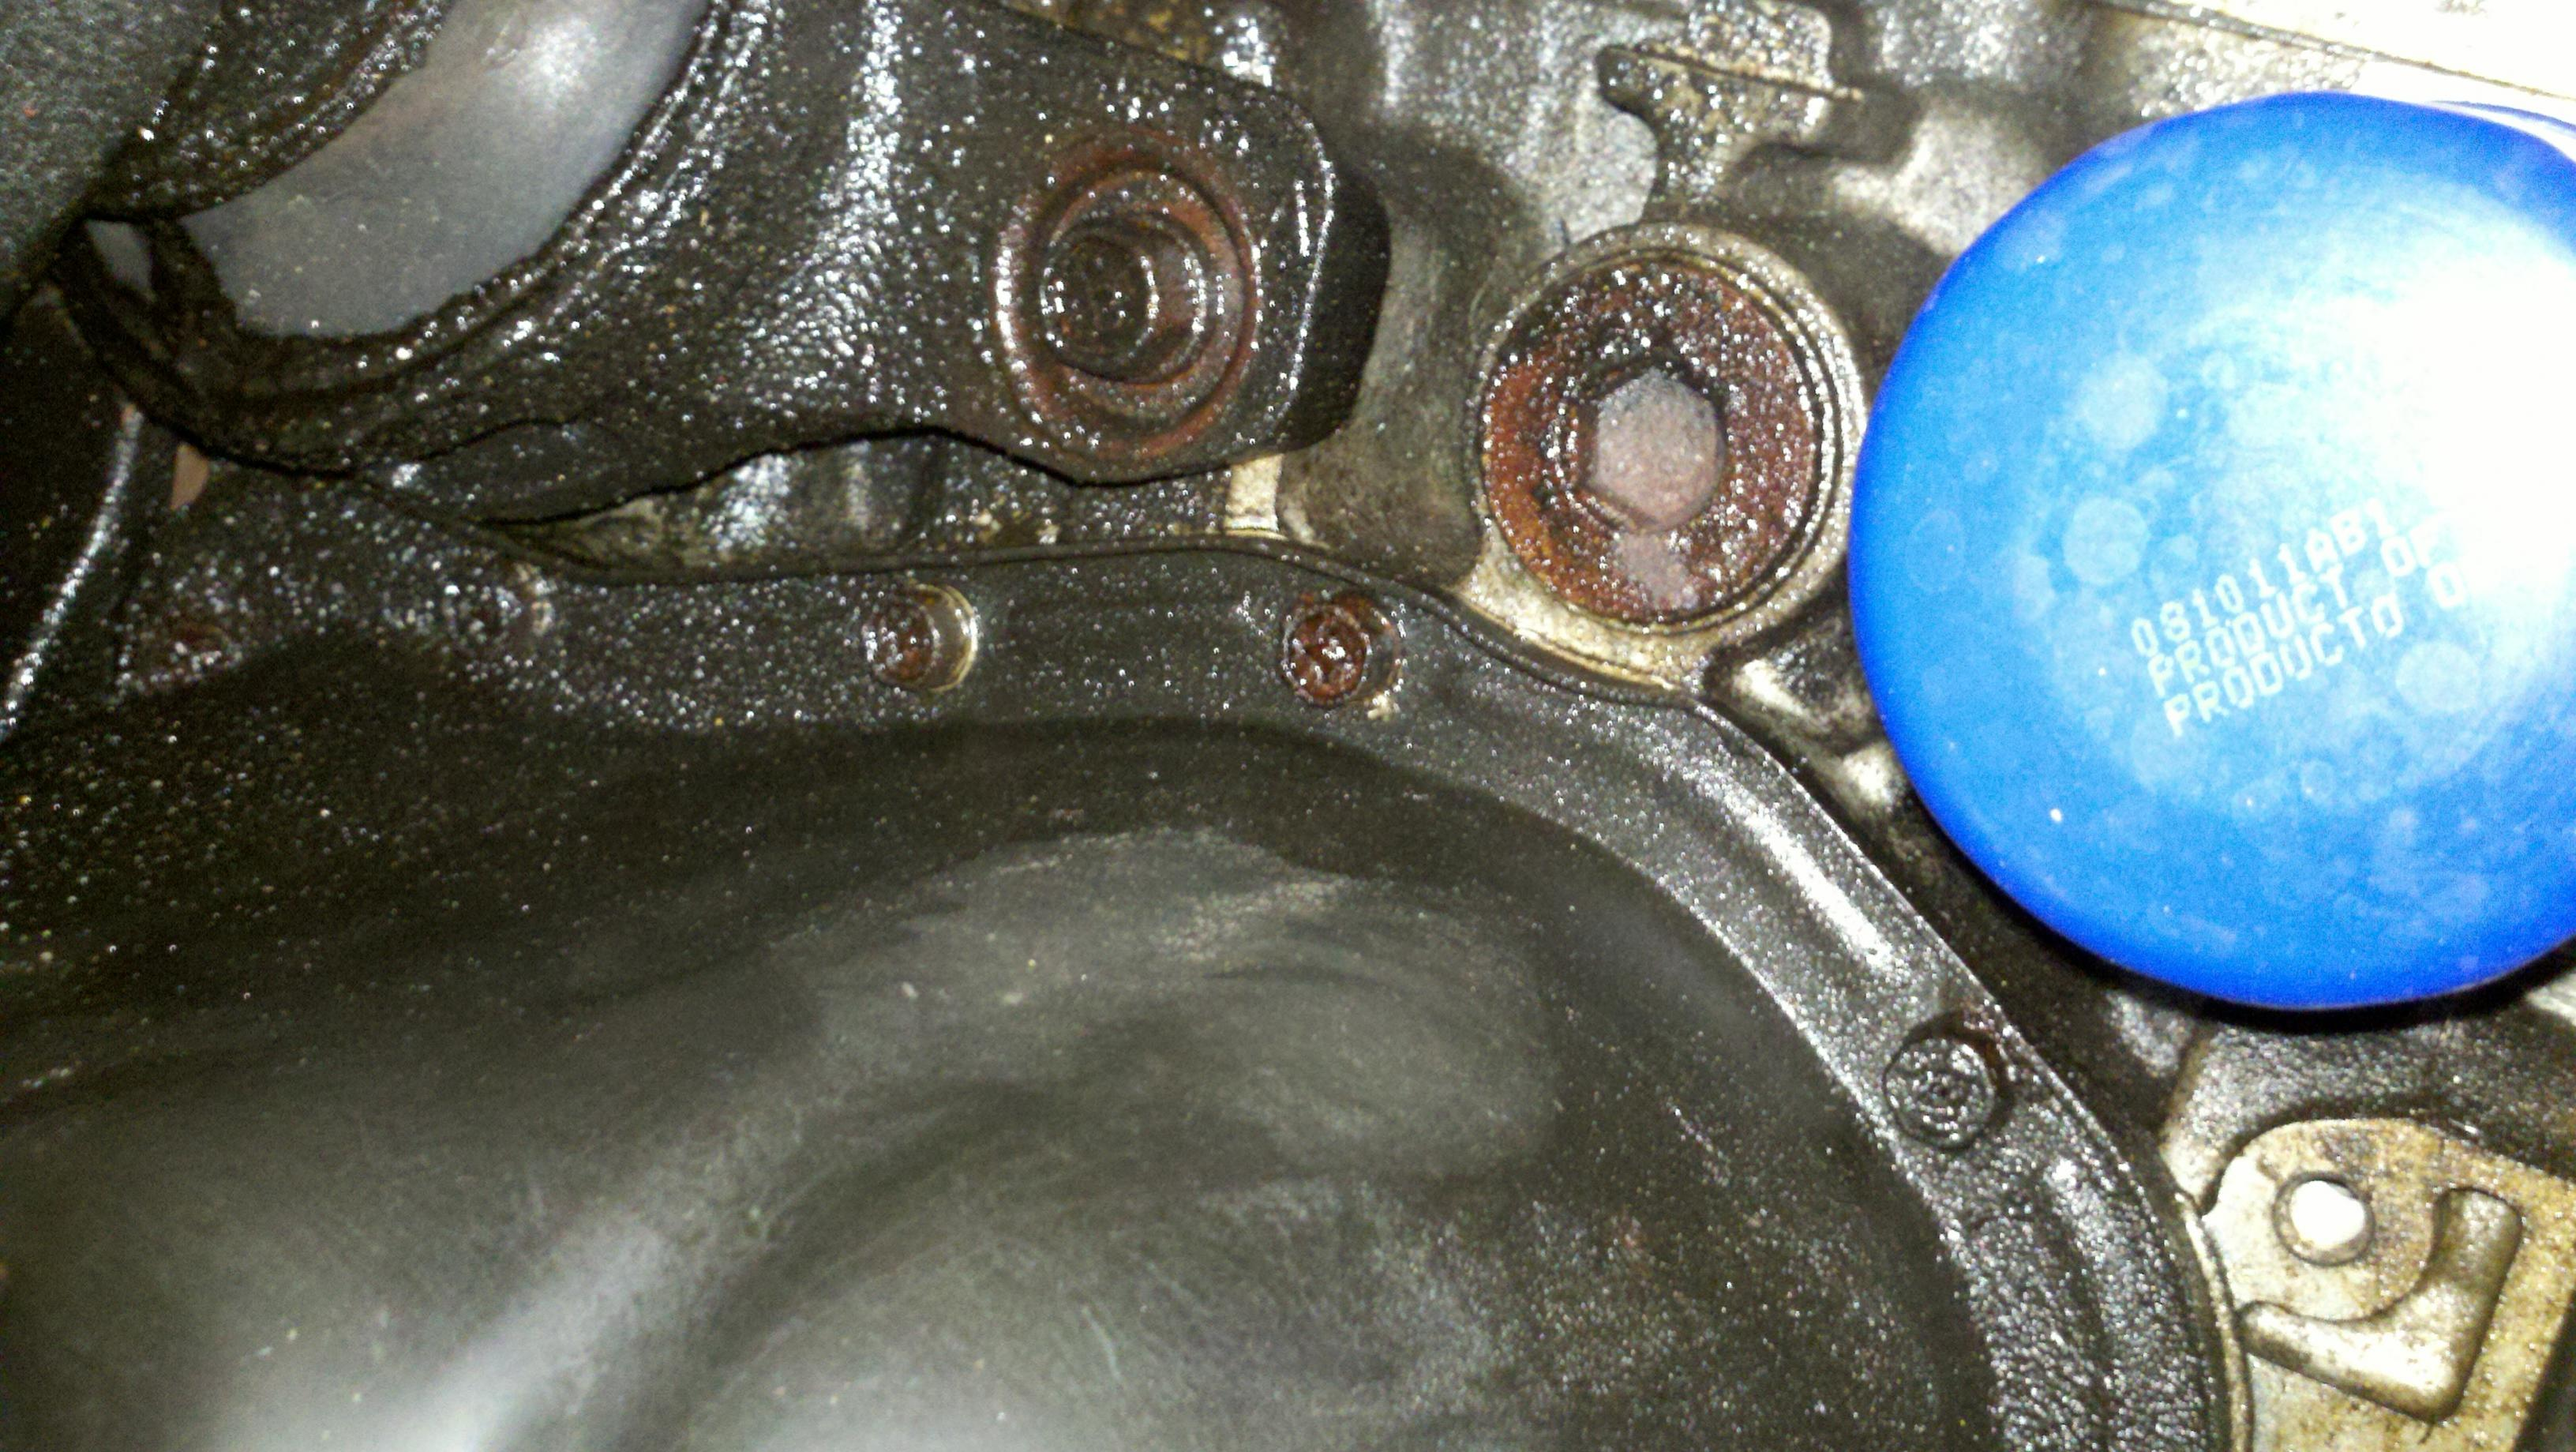 05 OBW oil leak - Subaru Outback - Subaru Outback Forums